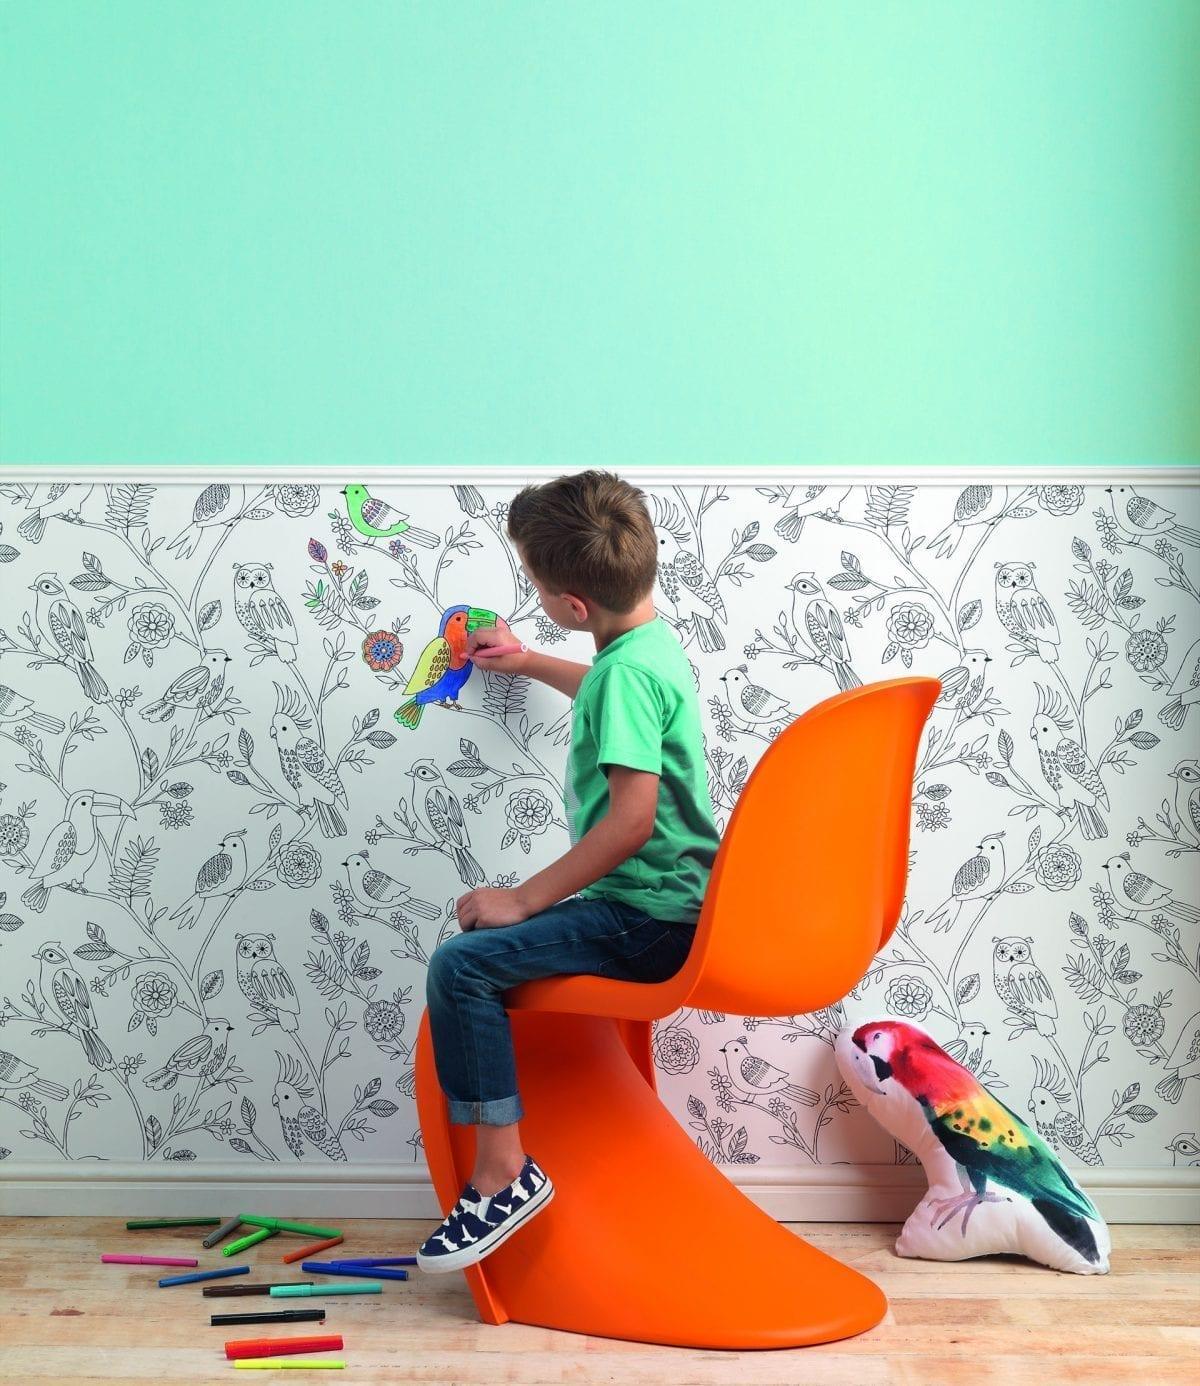 Papel mural para niños que se pinta 292909